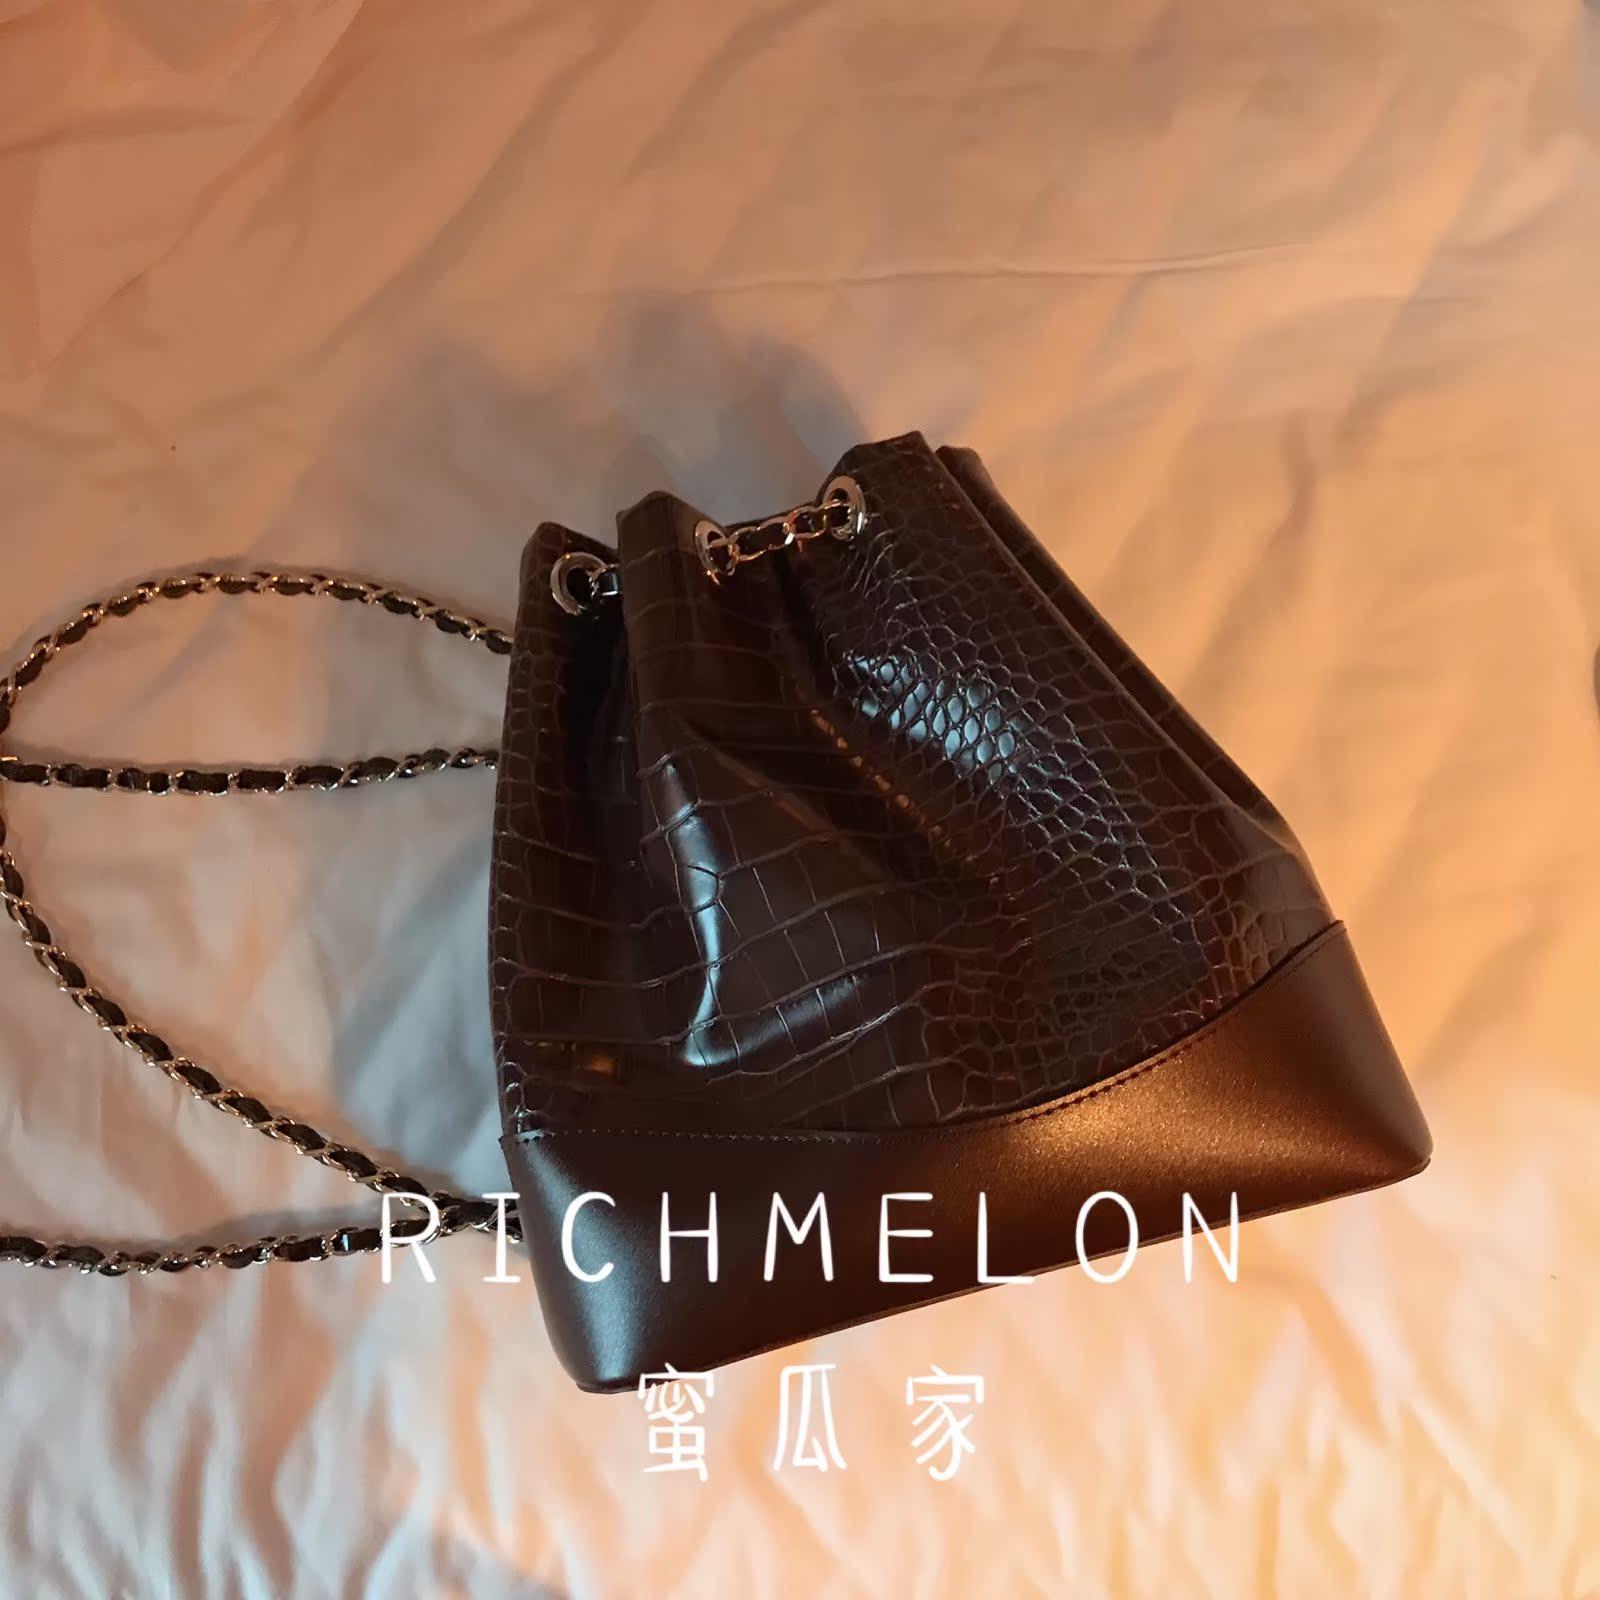 RICHMELON 韩国东大门代购正品 新款包包小香风双肩包链条女包